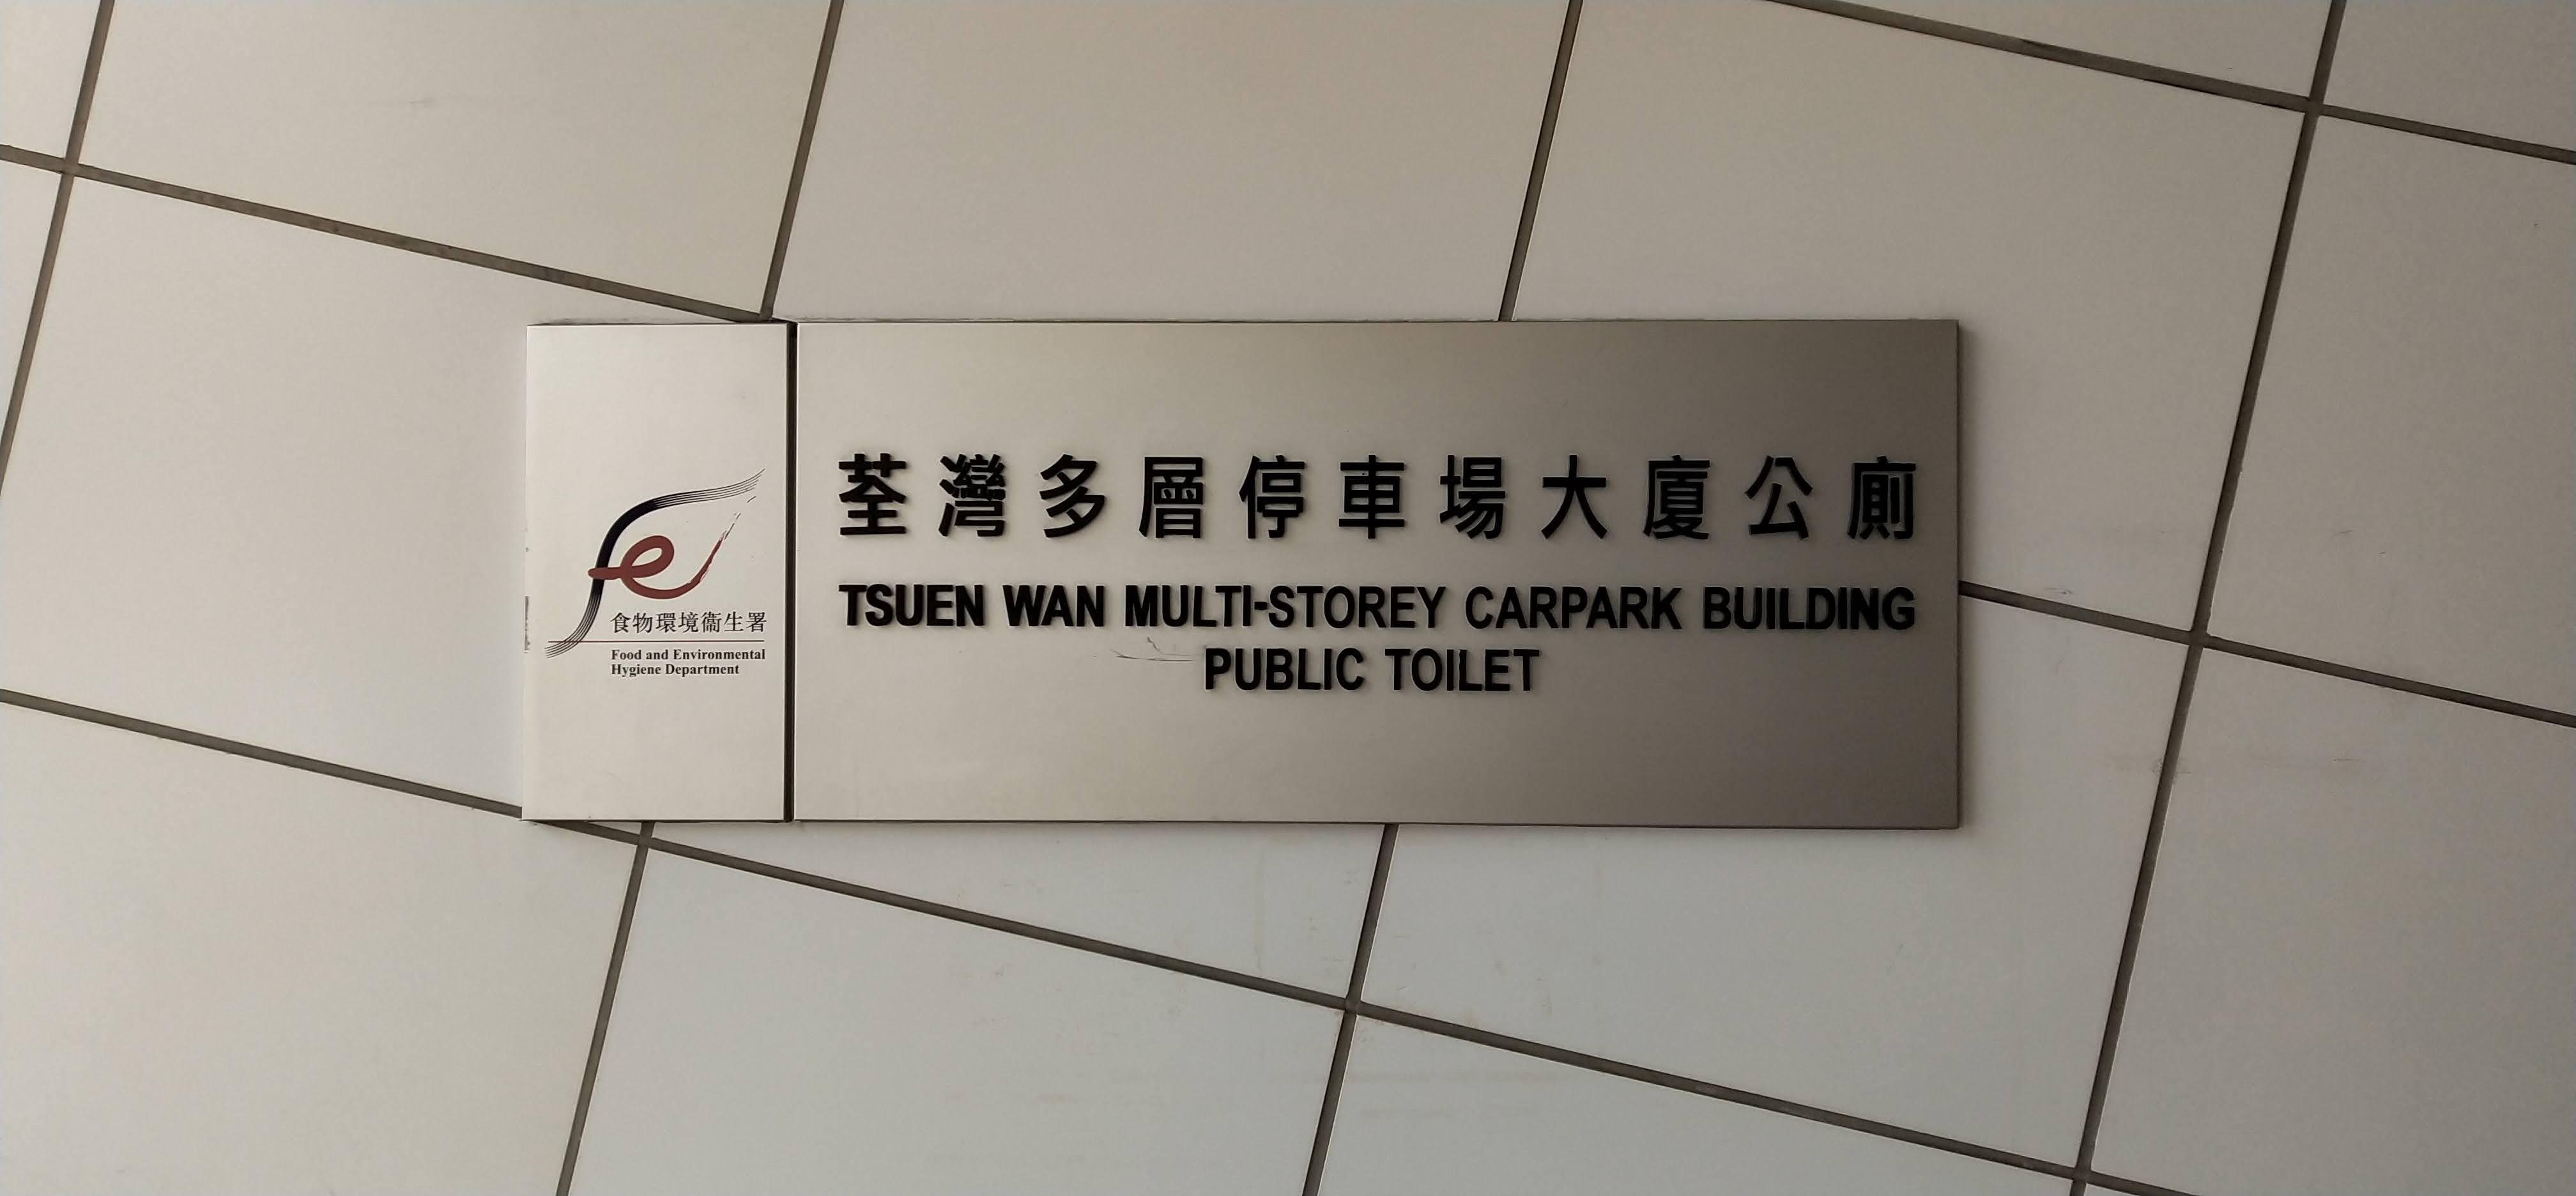 Tsuen Wan Multi-storey Carpark Building Public Toilet